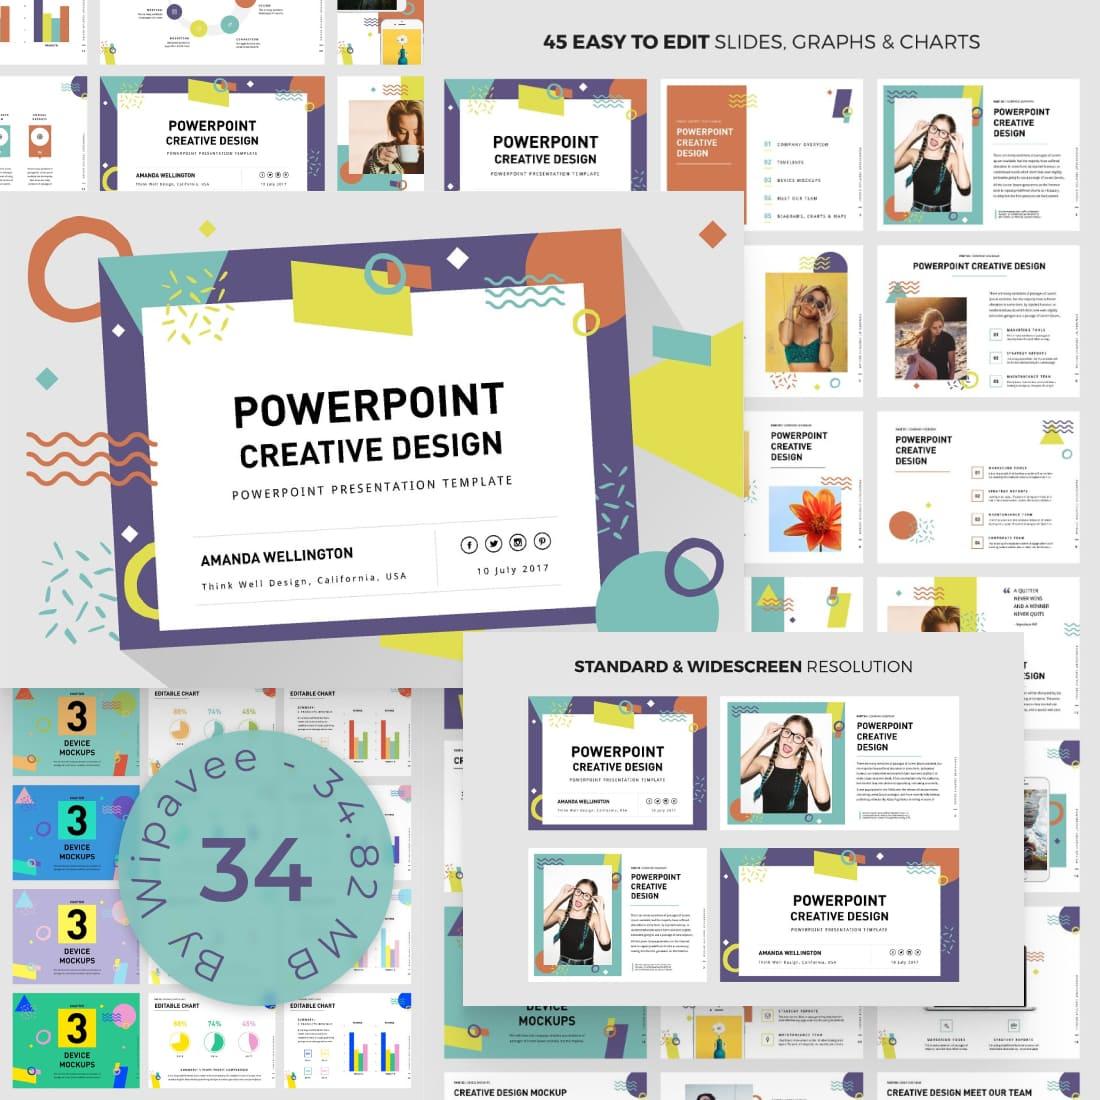 PowerPoint Creative Design Template by MasterBundles.